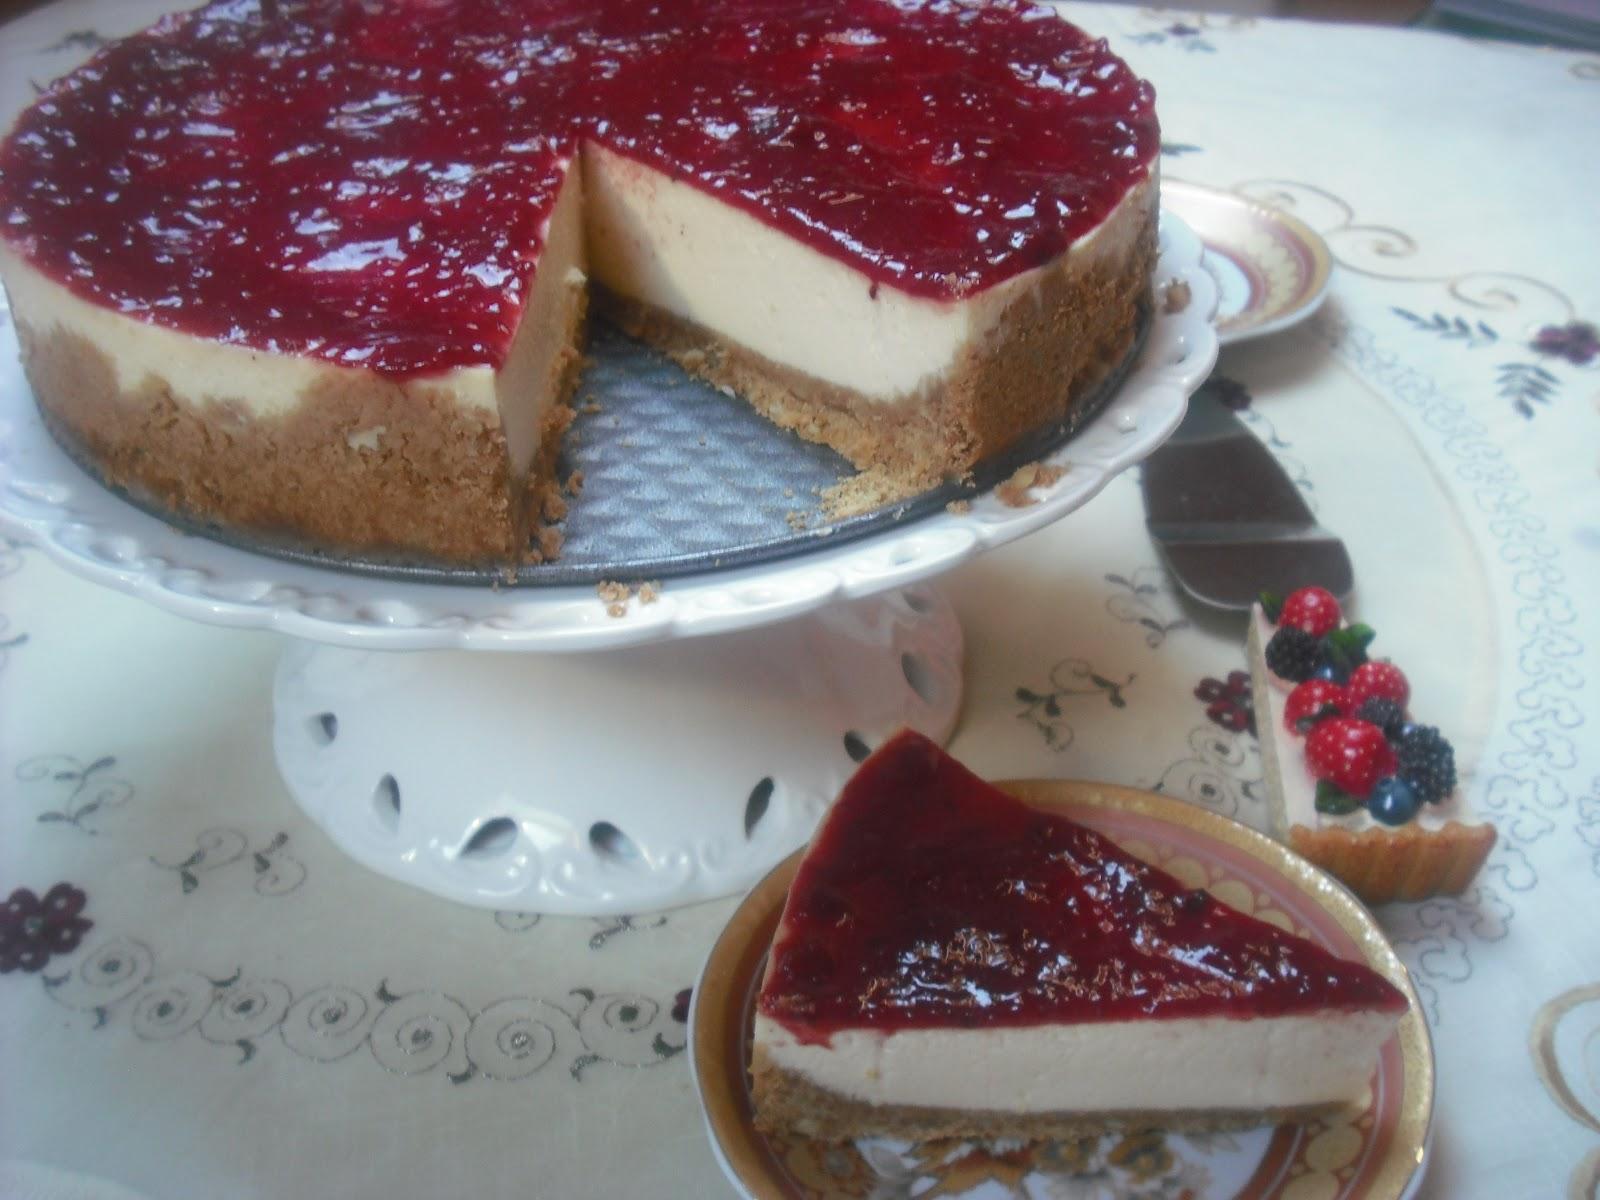 Operaci n pastelito new york cheesecake thermomix - Nata para cocinar mercadona ...